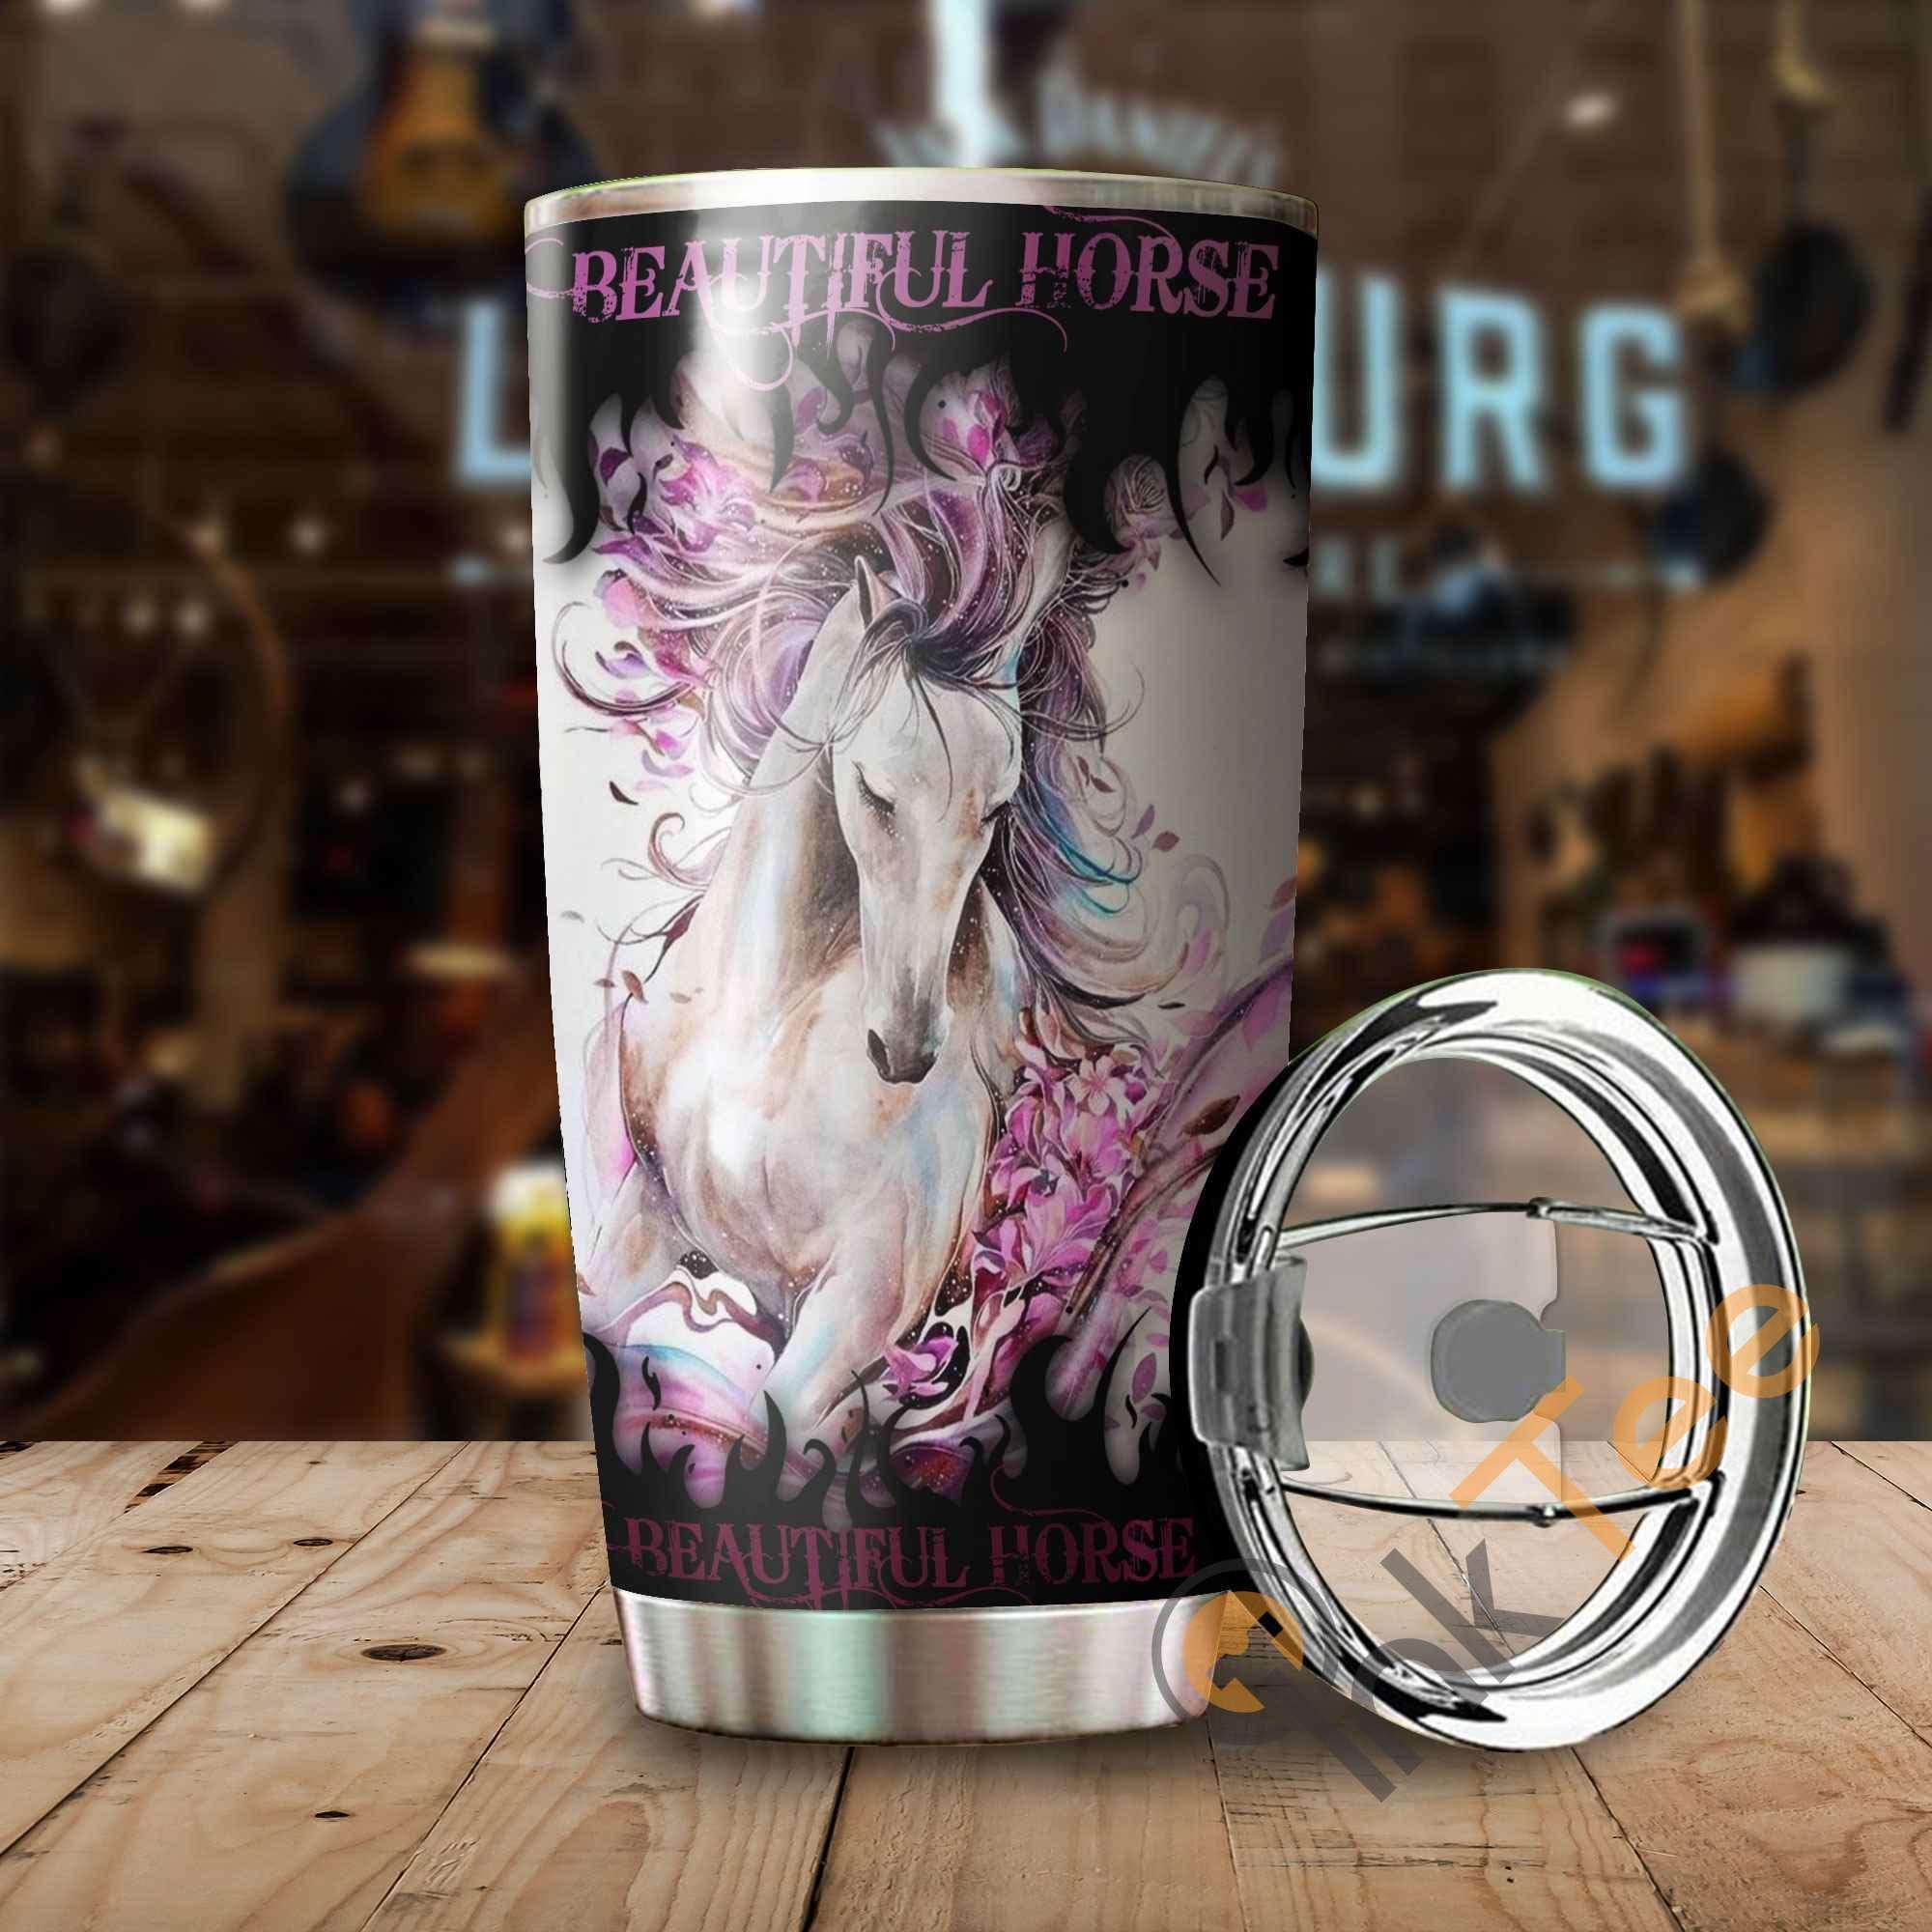 Beautiful Horse Amazon Best Seller Sku 3436 Stainless Steel Tumbler